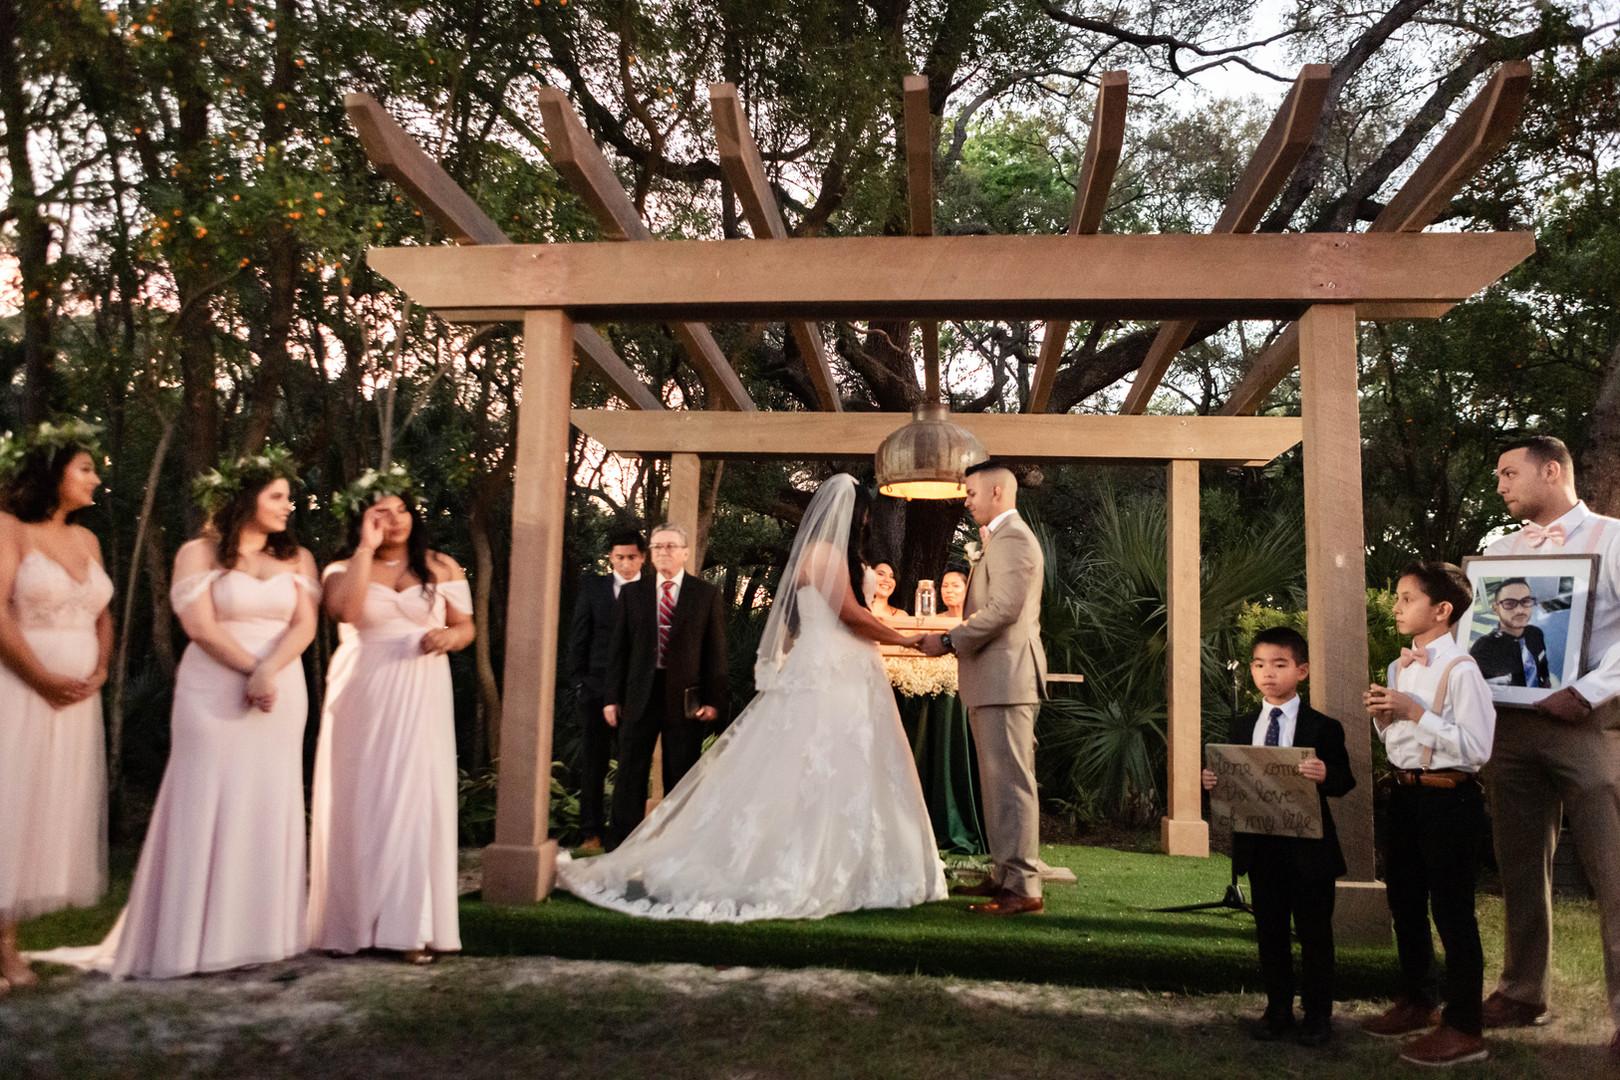 Wedding Ceremony in our Silo Garden